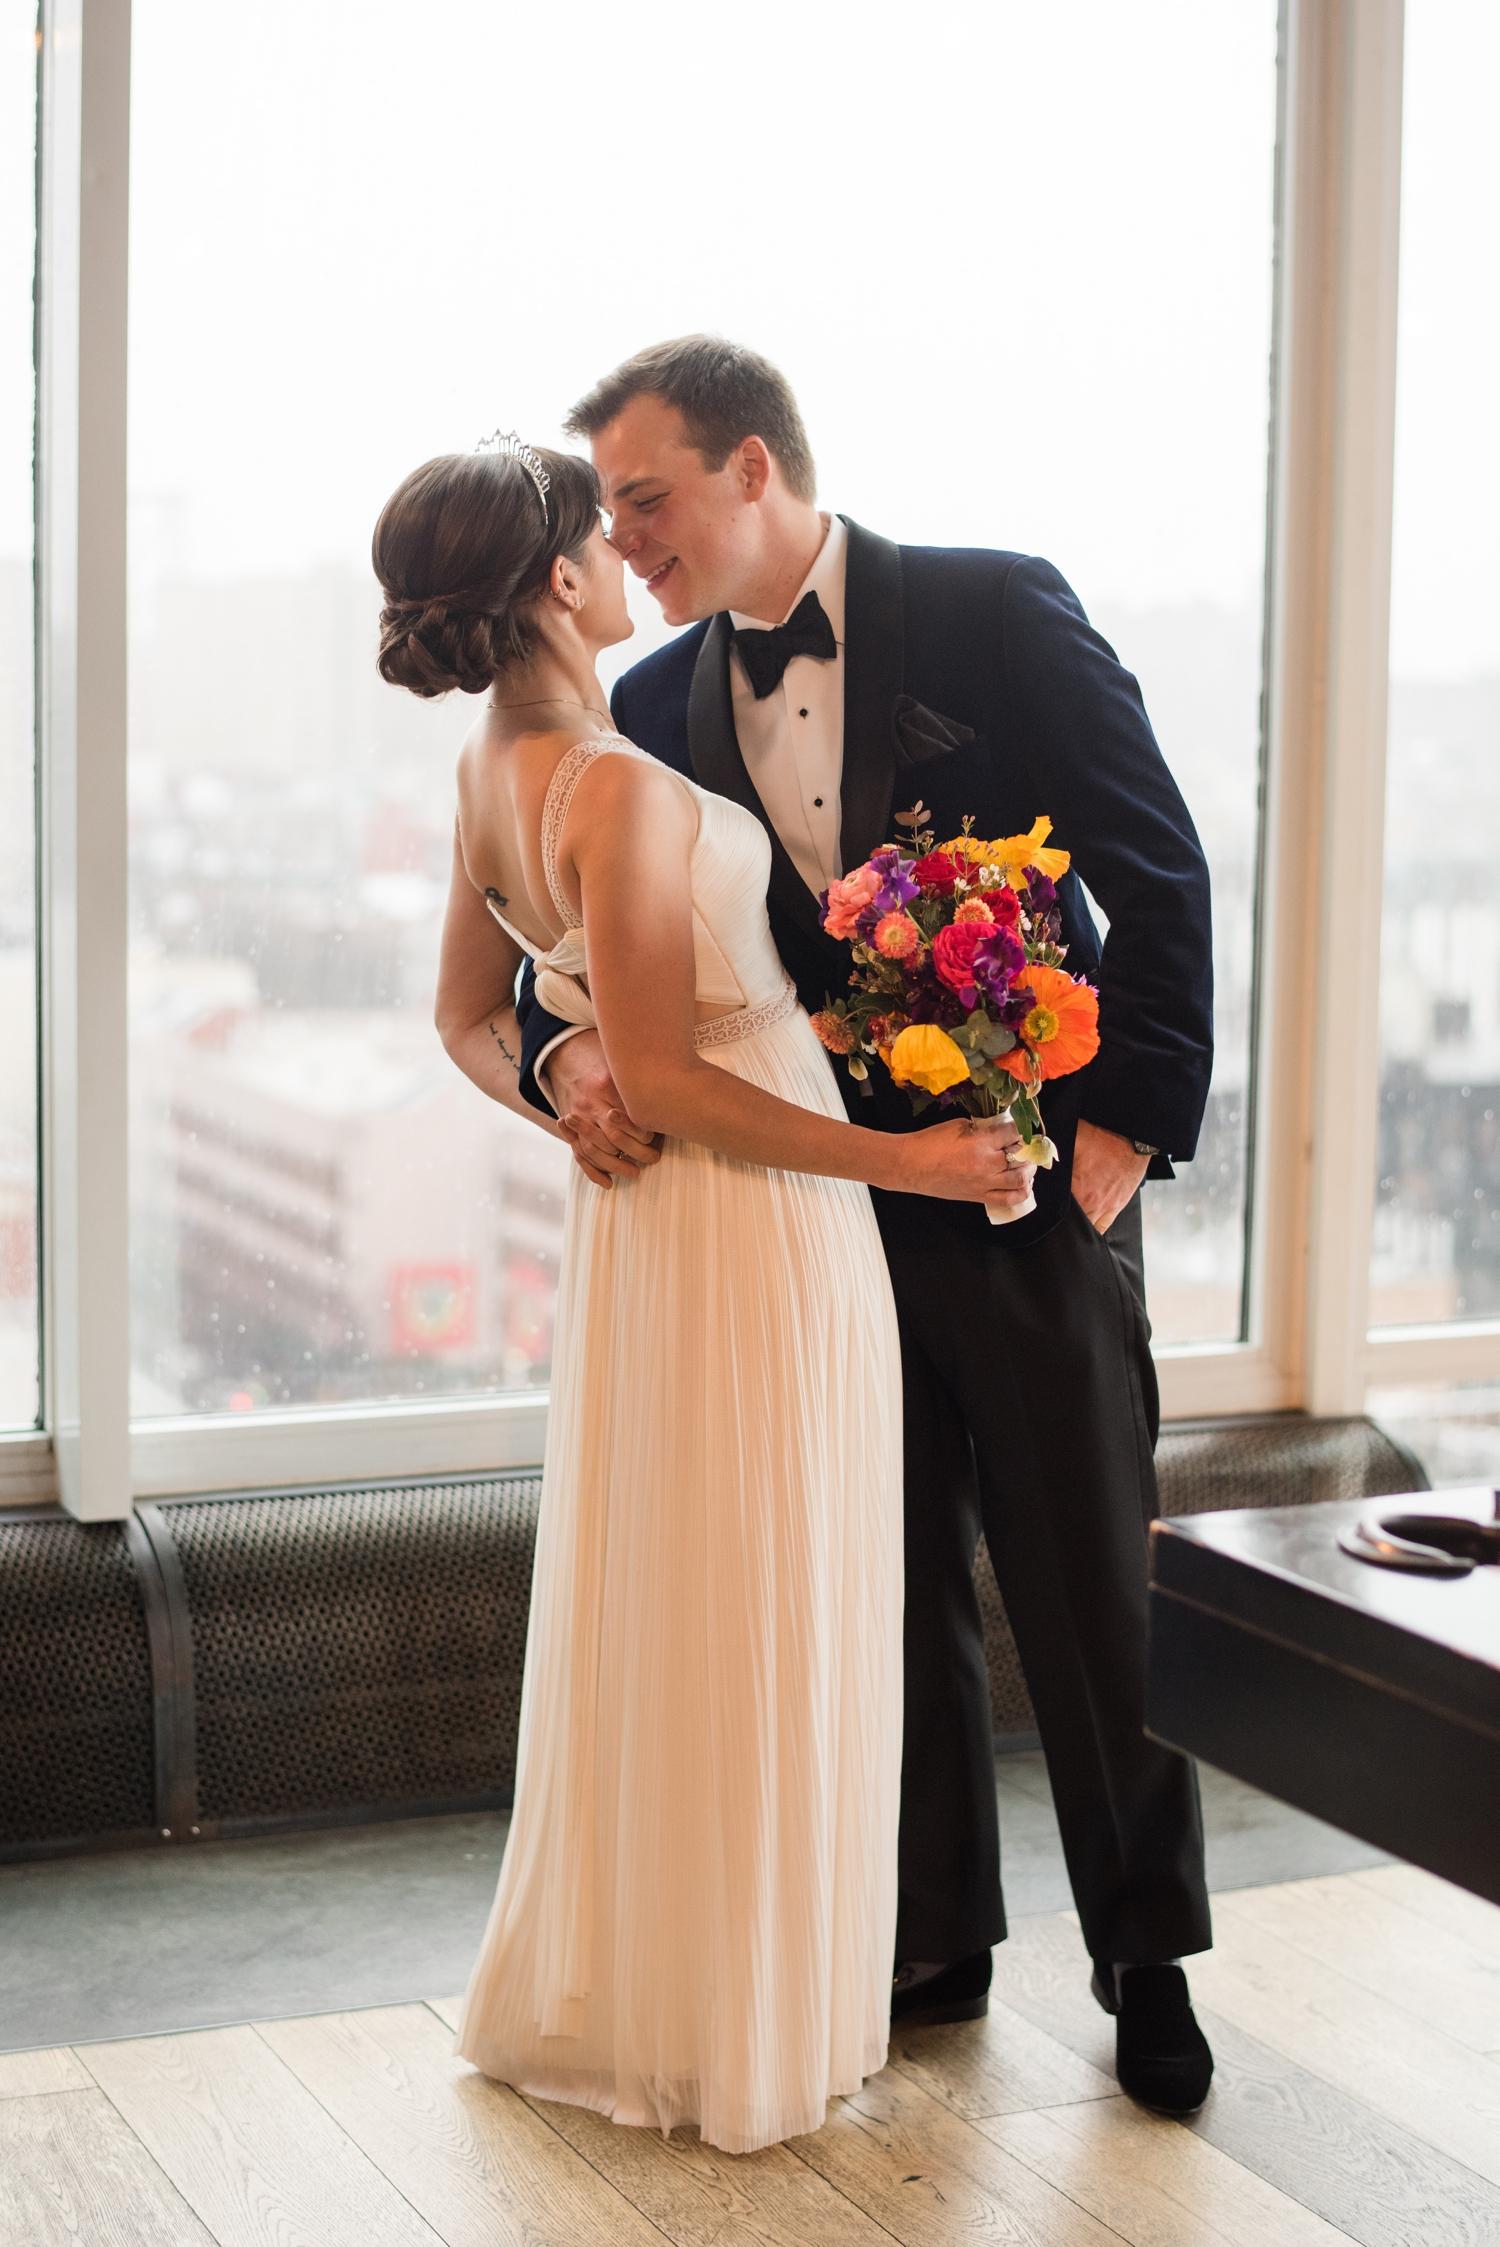 Hotel Indigo NYC Wedding photographer